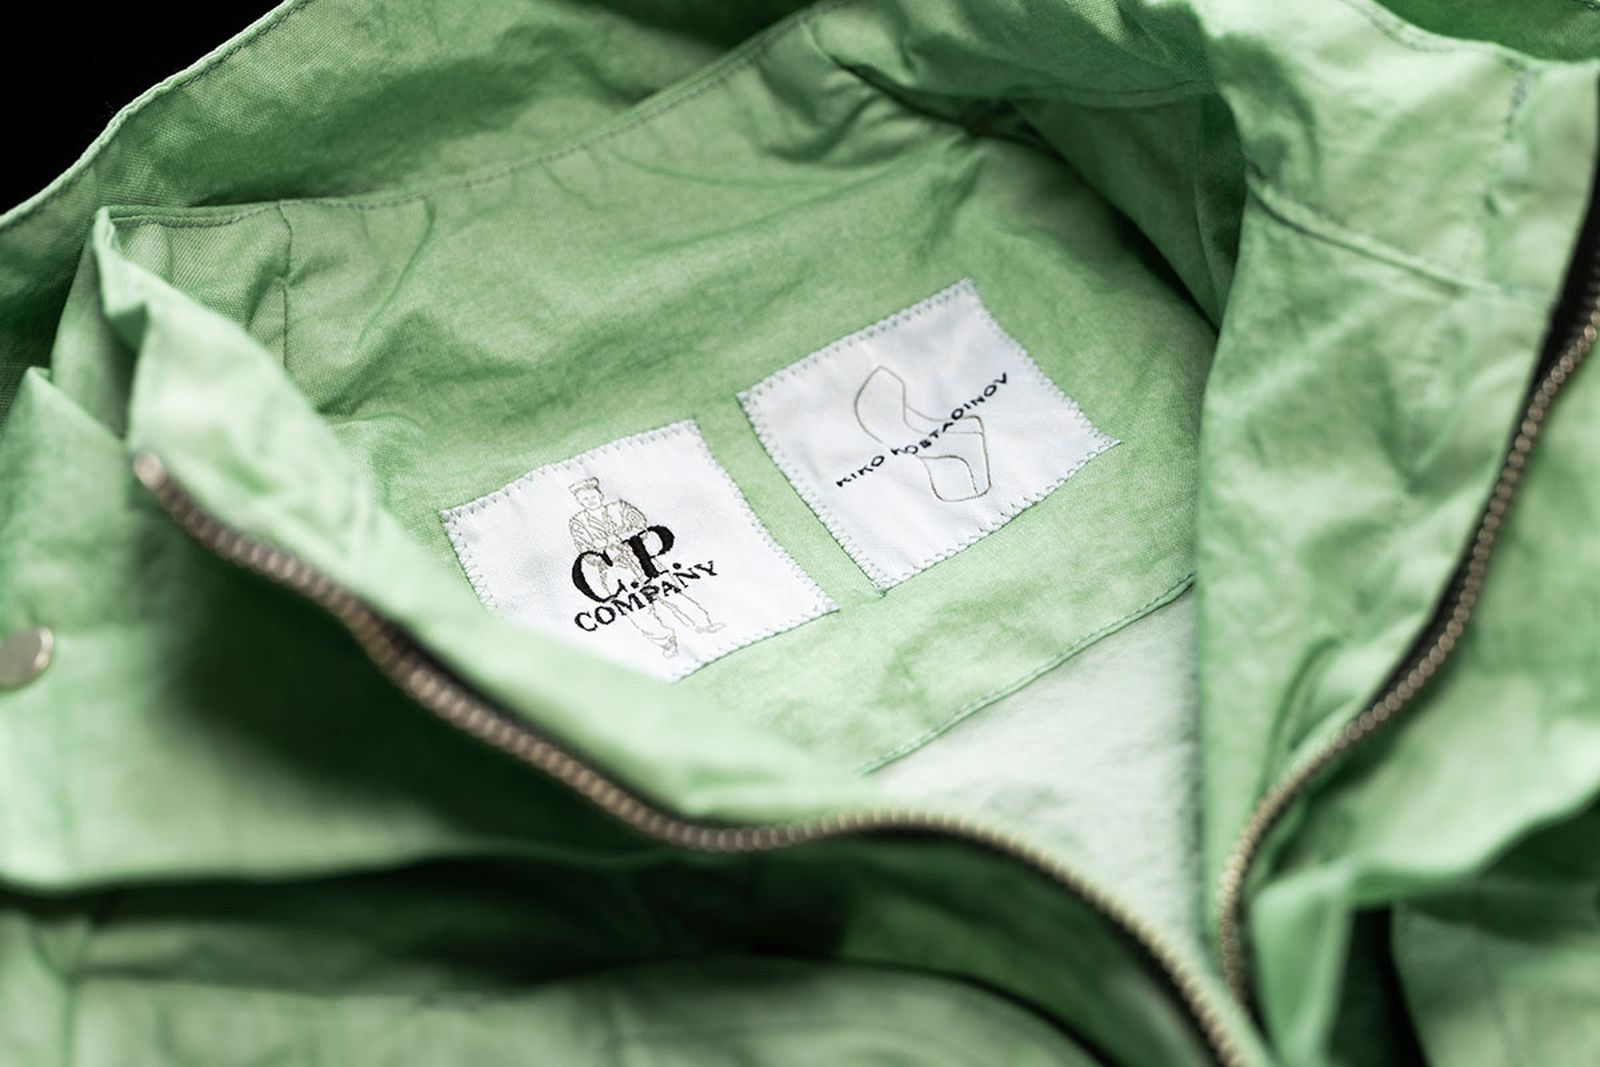 kiko-kosta-cp-company-jacket-details-08